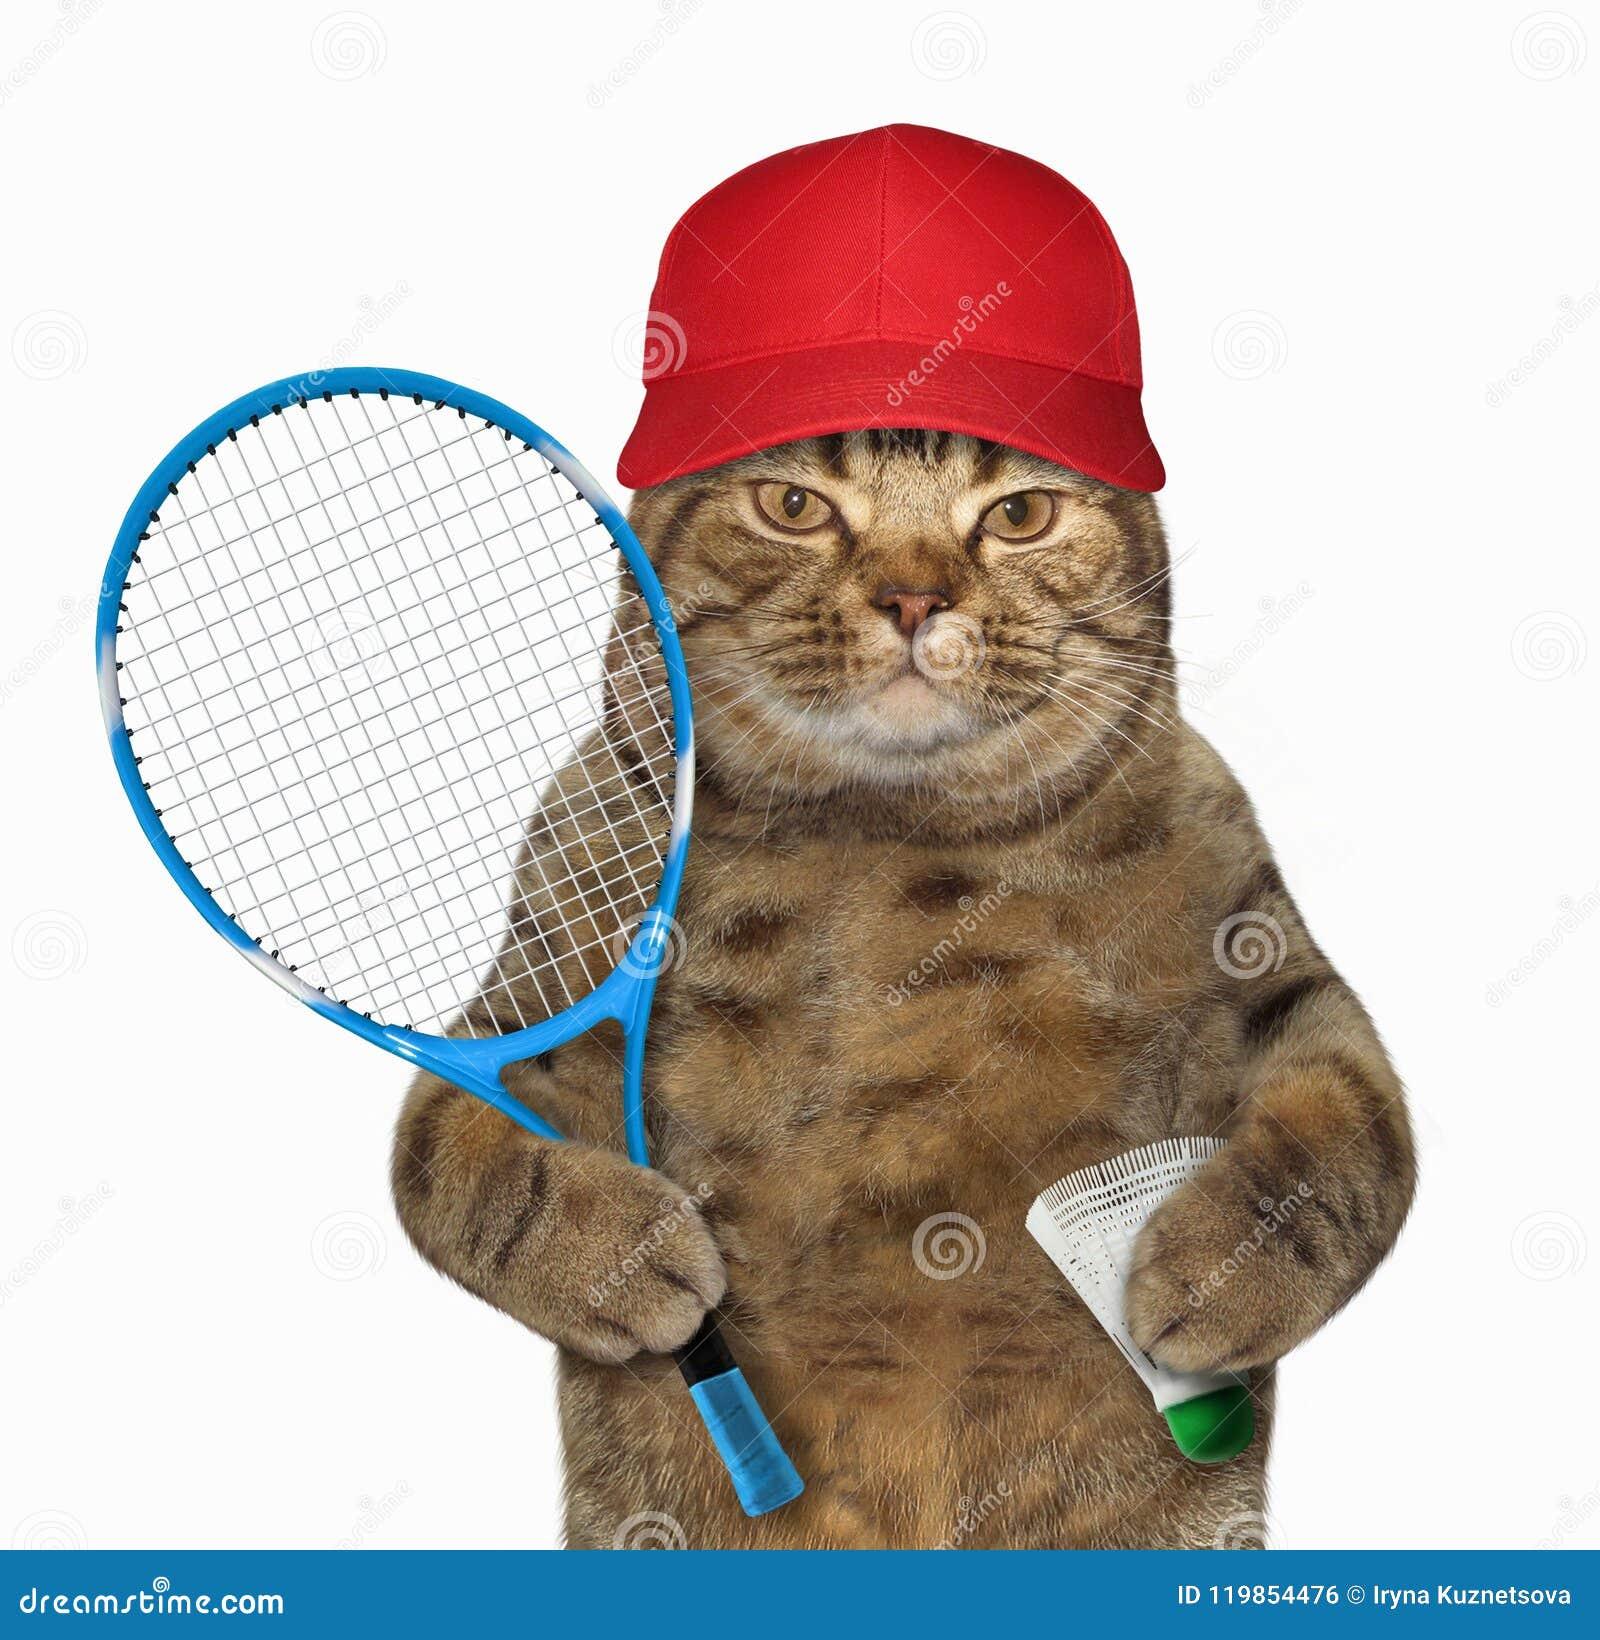 Gato com raquete de badminton